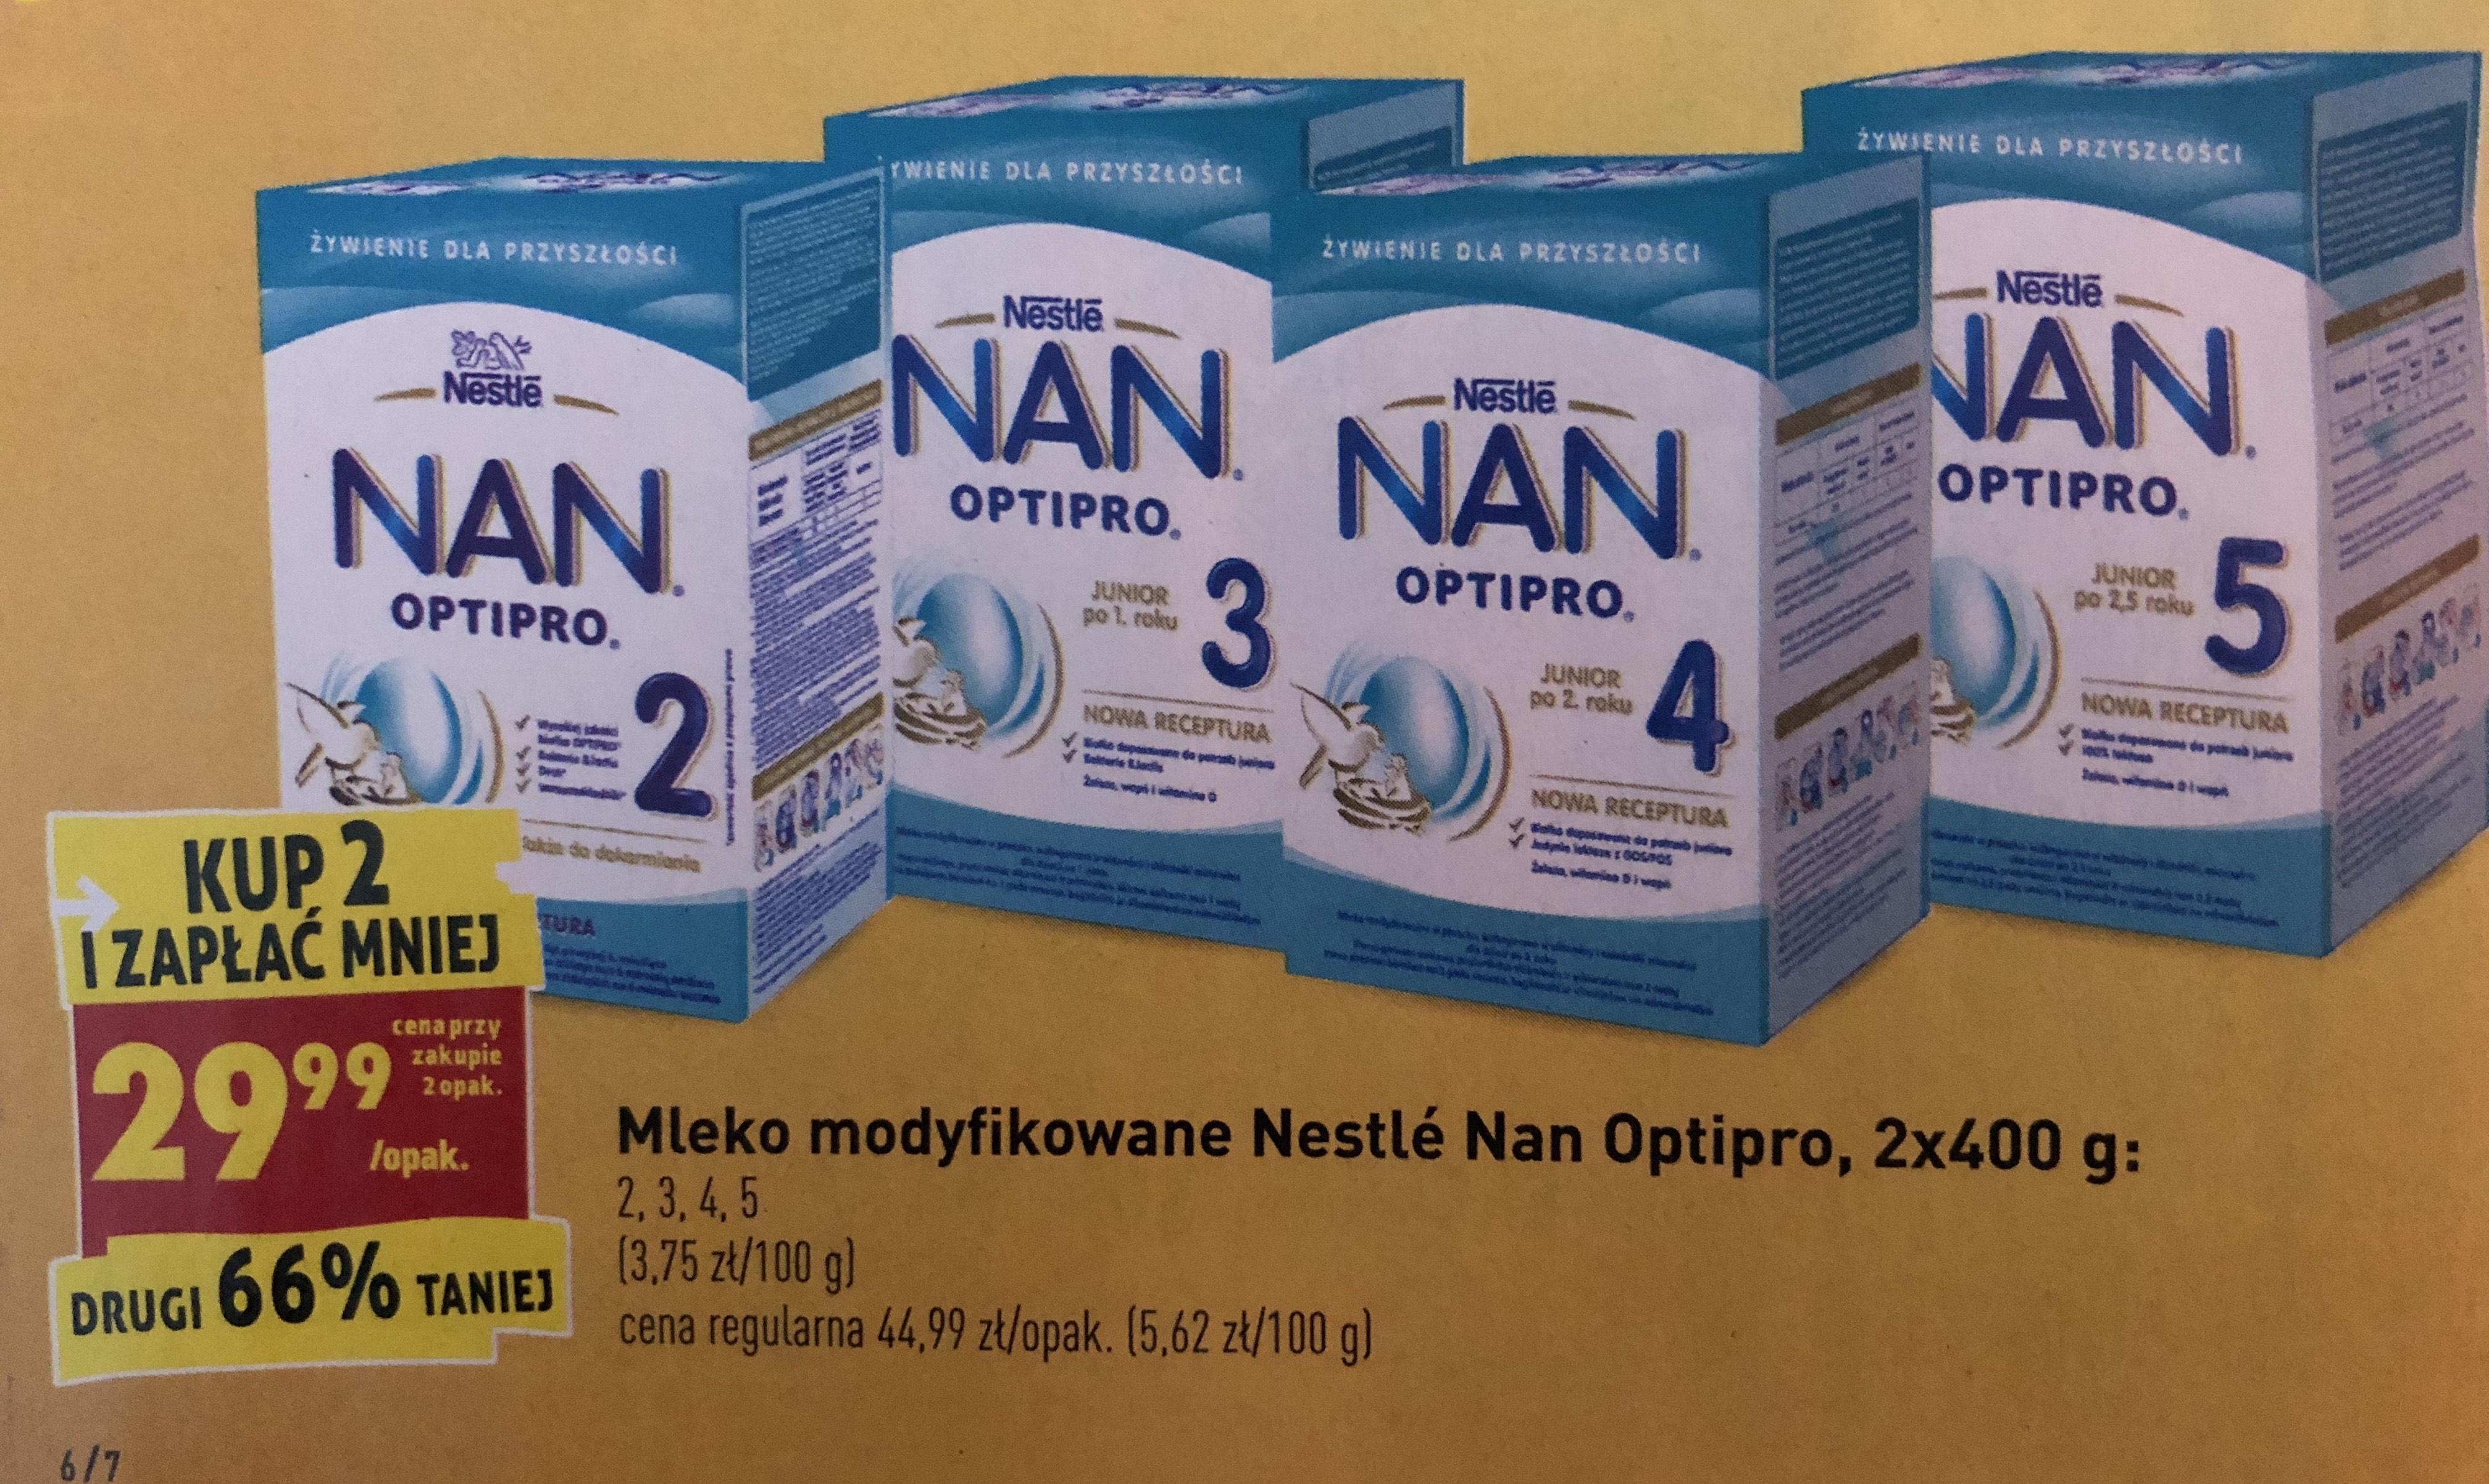 Mleko Nestle Nan Optipro druga sztuka 66% taniej Biedronka